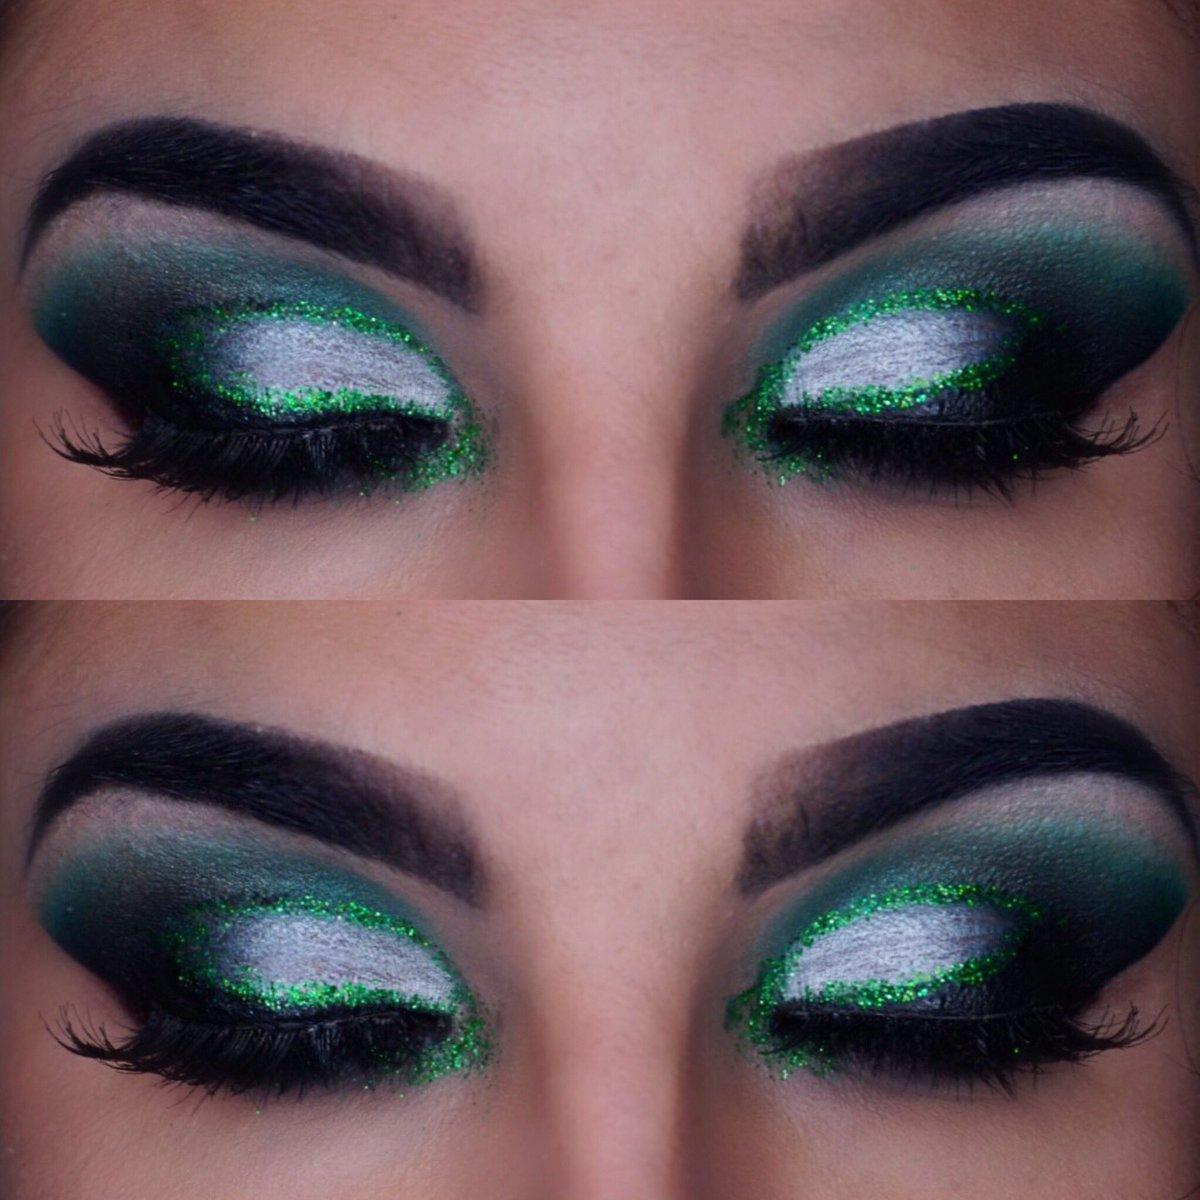 Manon Tissier On Twitter Close Up Of My Glitter Goth Eye Makeup